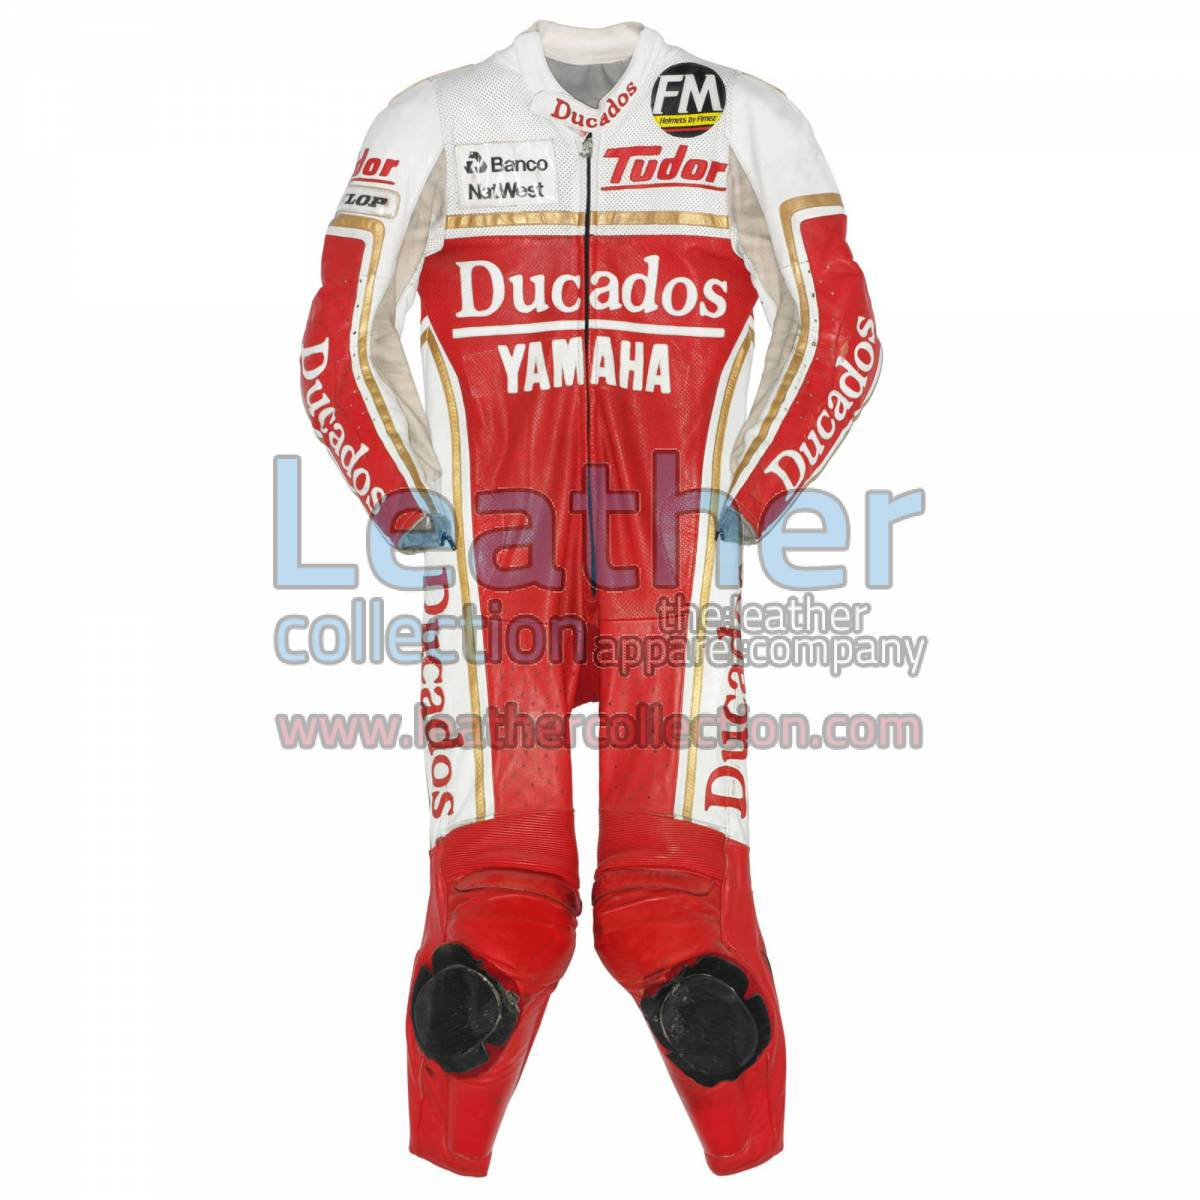 Alberto Puig Yamaha GP 1992 Racing Suit